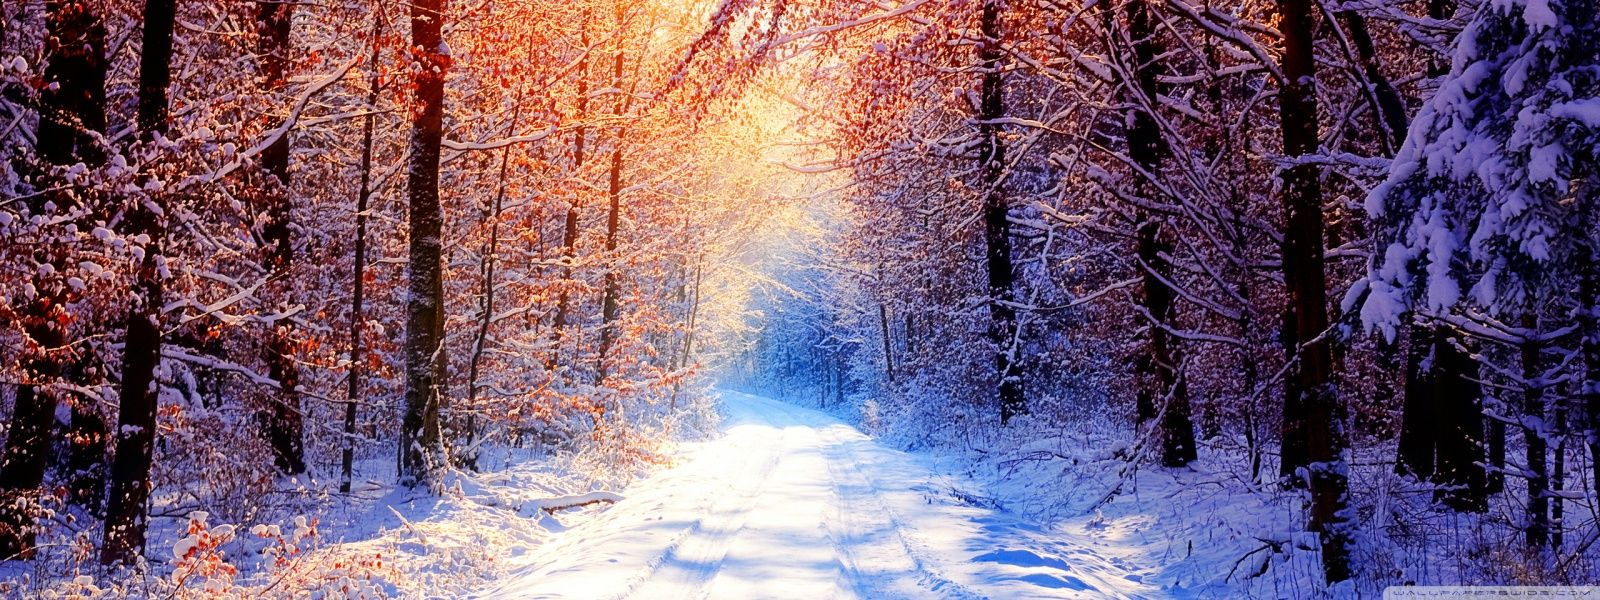 Winter Widescreen Wallpaper Wide Is Cool Wallpapers Winter Wallpaper Screen Wallpaper Widescreen Wallpaper